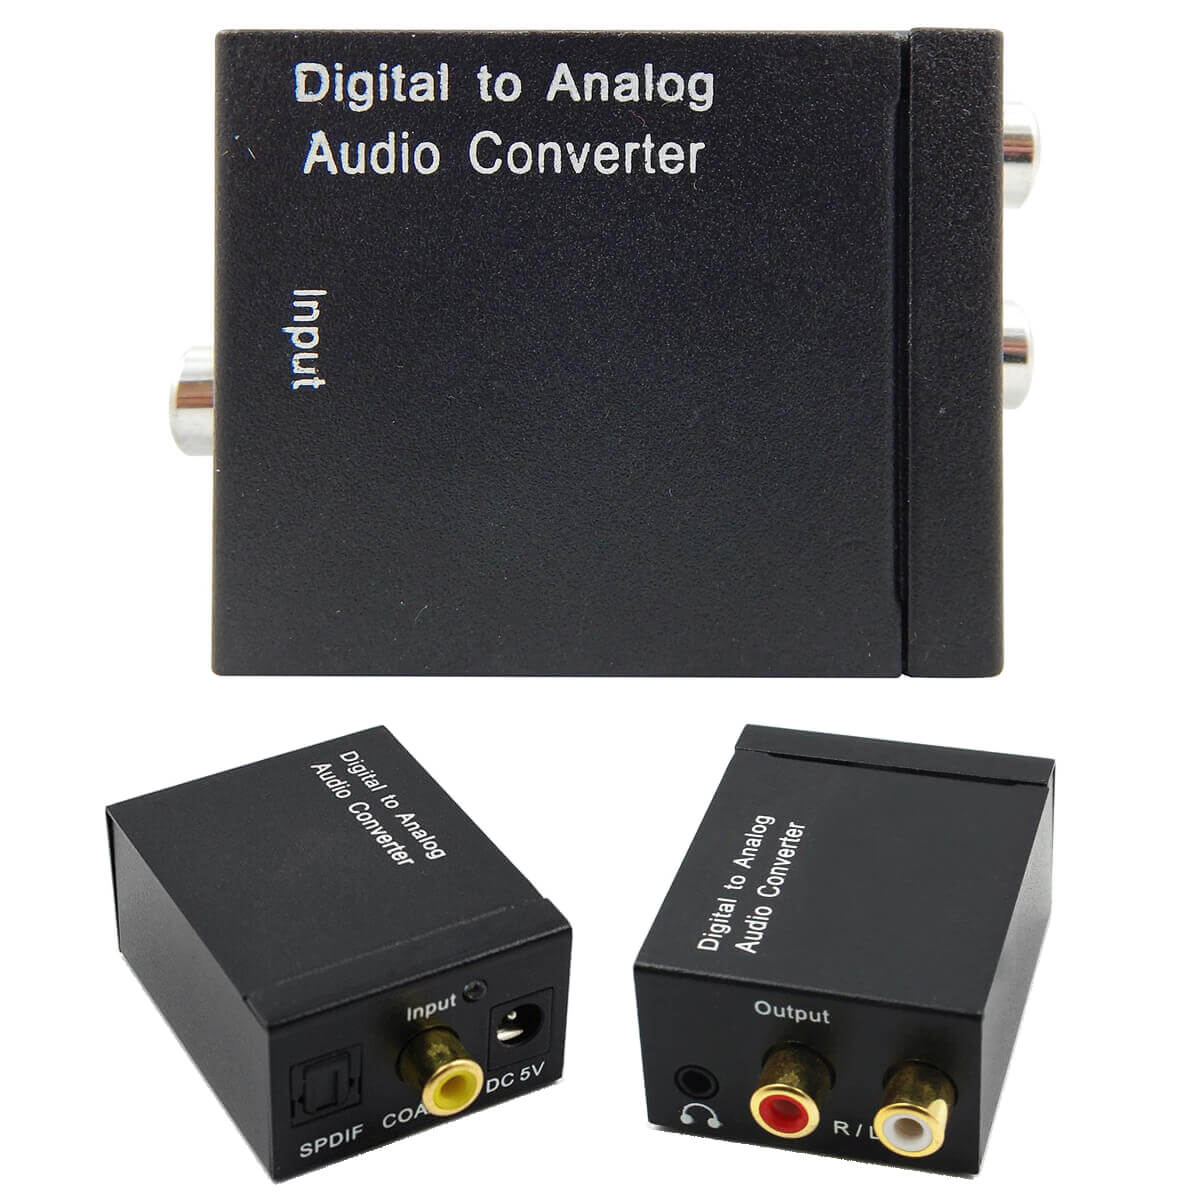 KIT Conversor Áudio Digital para RCA e P2 XT-5529 + Cabo Óptico Toslink 1,5 mts + Cabo Áudio P2 x P2 + Cabo DC 5V